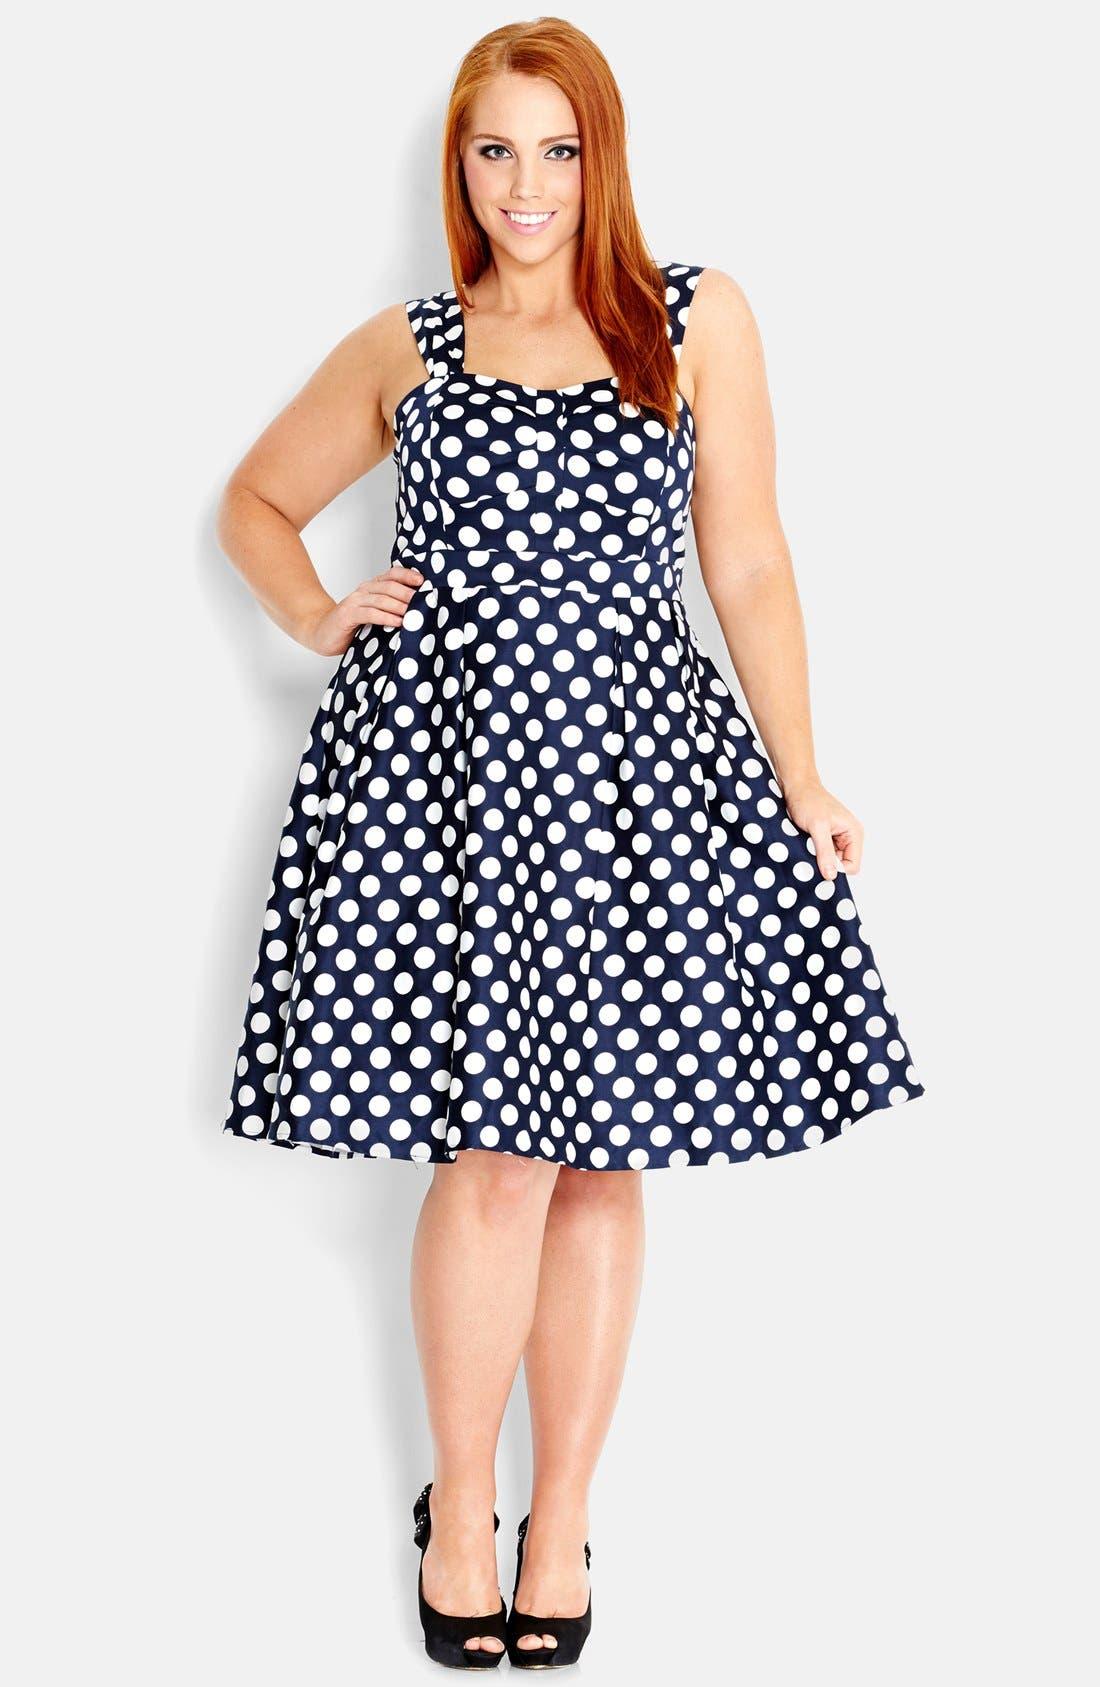 Main Image - City Chic 'Spotty Fun' Fit & Flare Dress (Plus Size)